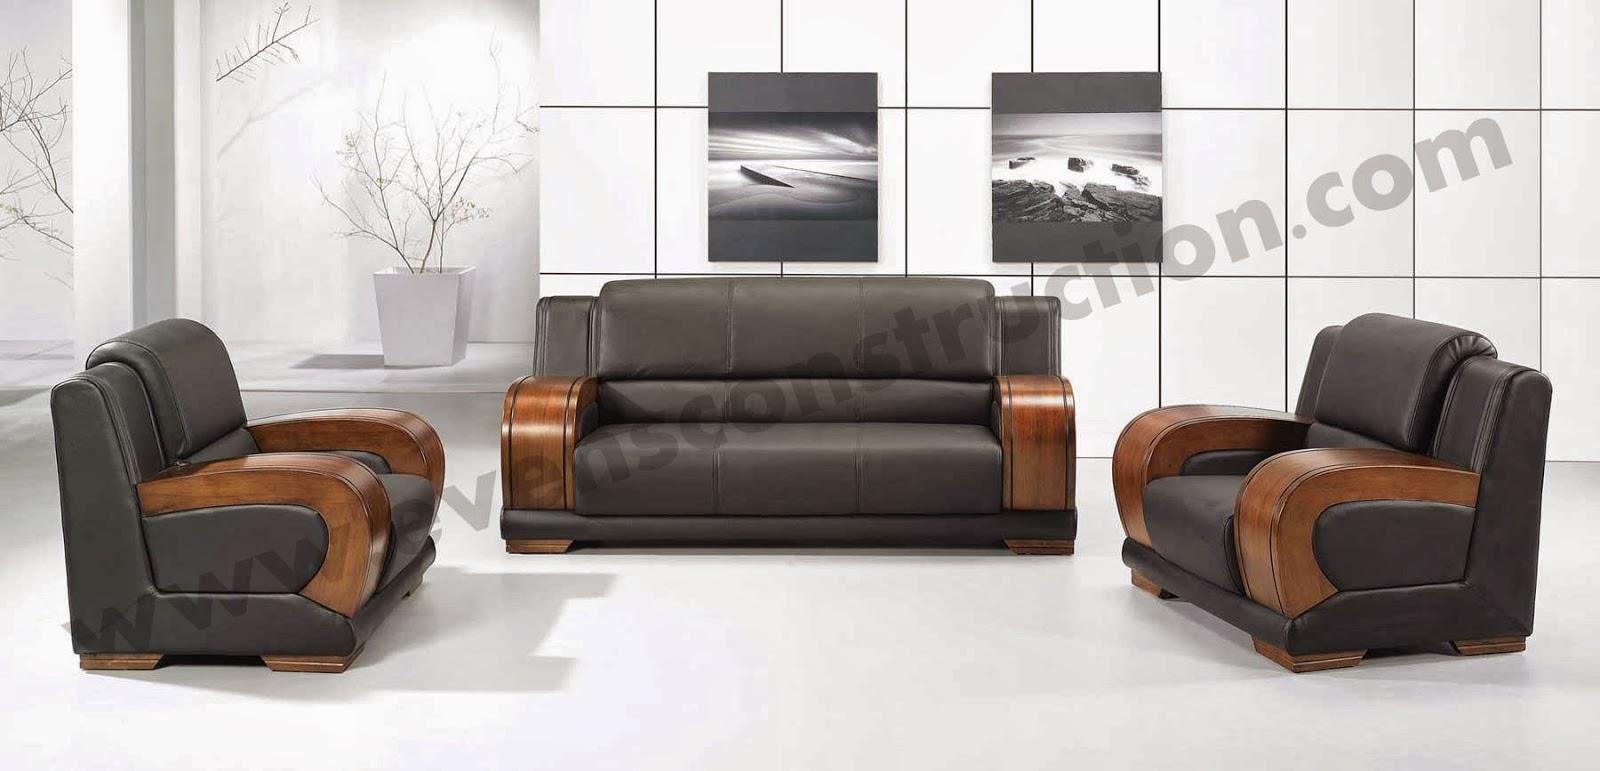 wooden sofas gallery garden decoration ideas homemade. Black Bedroom Furniture Sets. Home Design Ideas